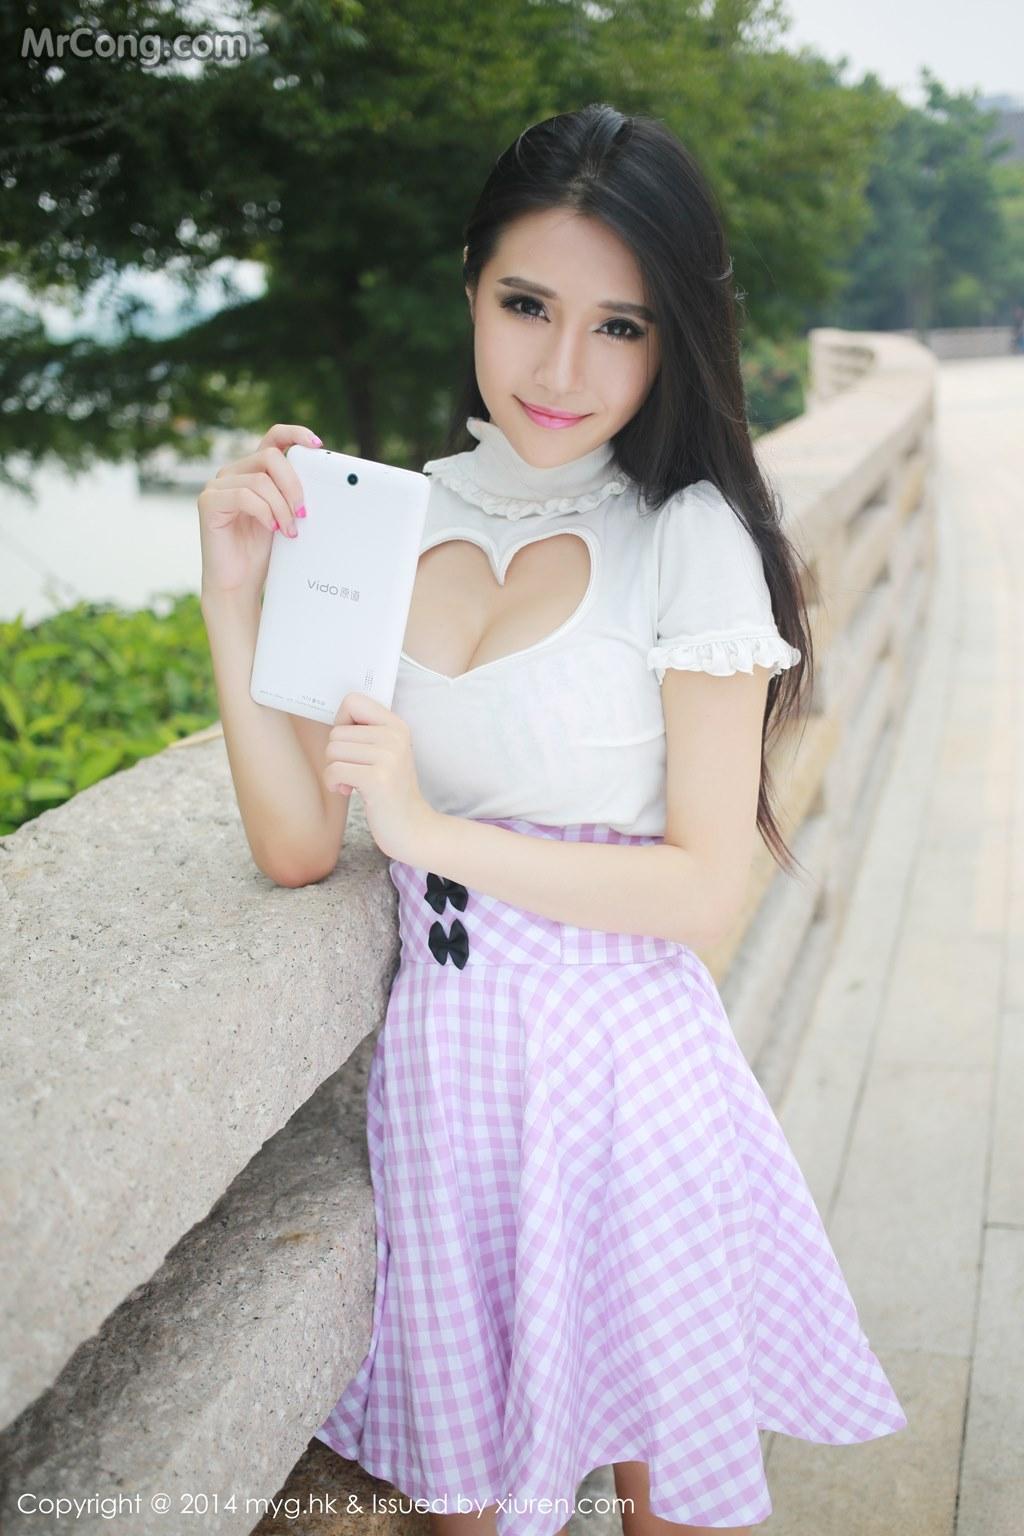 MyGirl Vol.018: Model Yu Da Xiaojie AYU (于大小姐AYU) (59P)